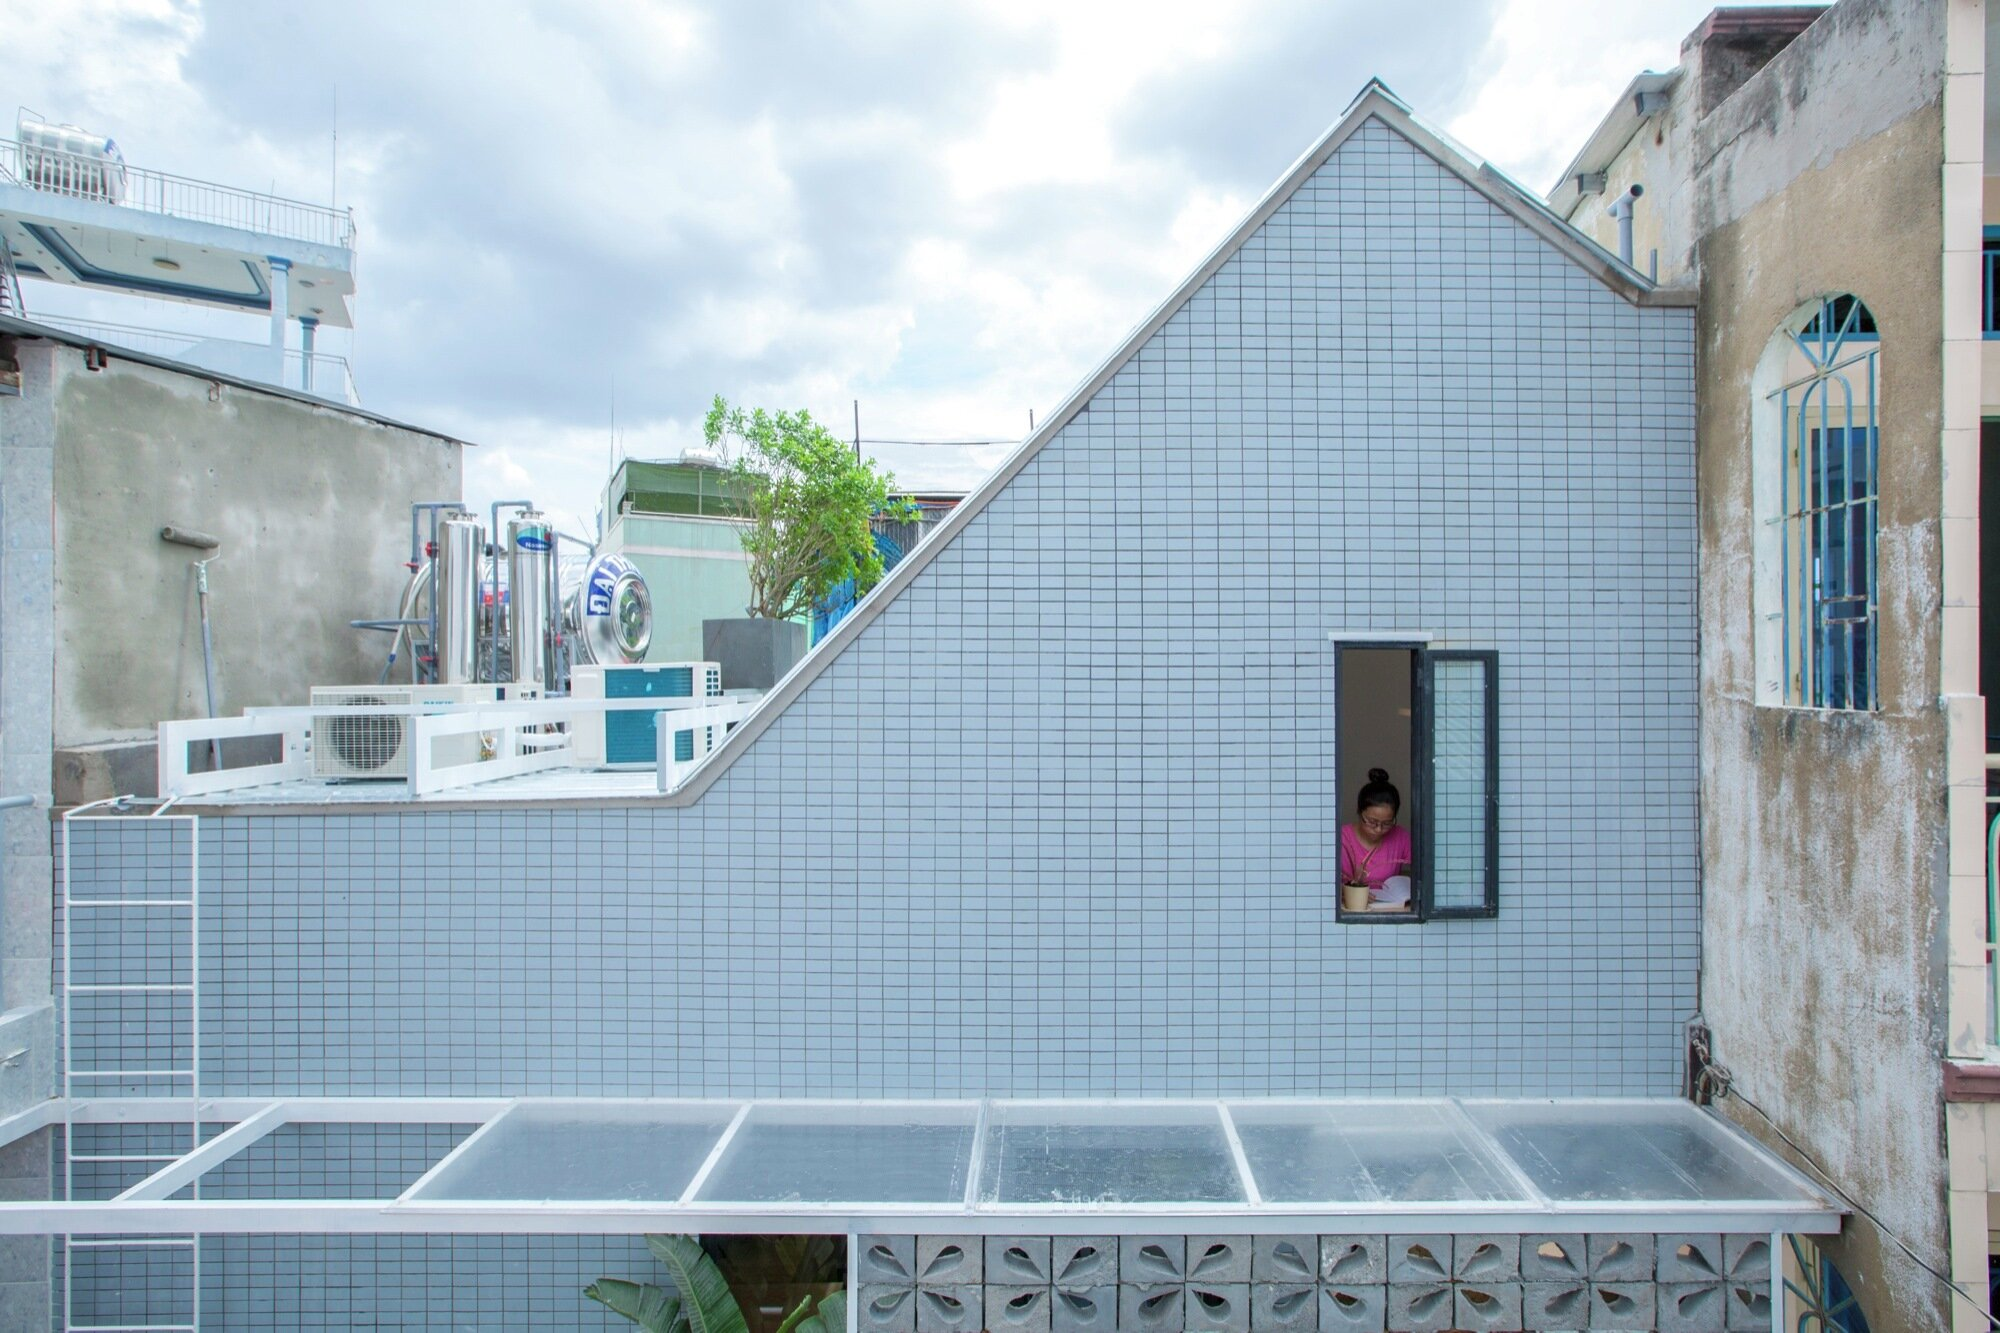 2.5 House - Khuon Studio - Vietnam - Exterior - Humble Homes